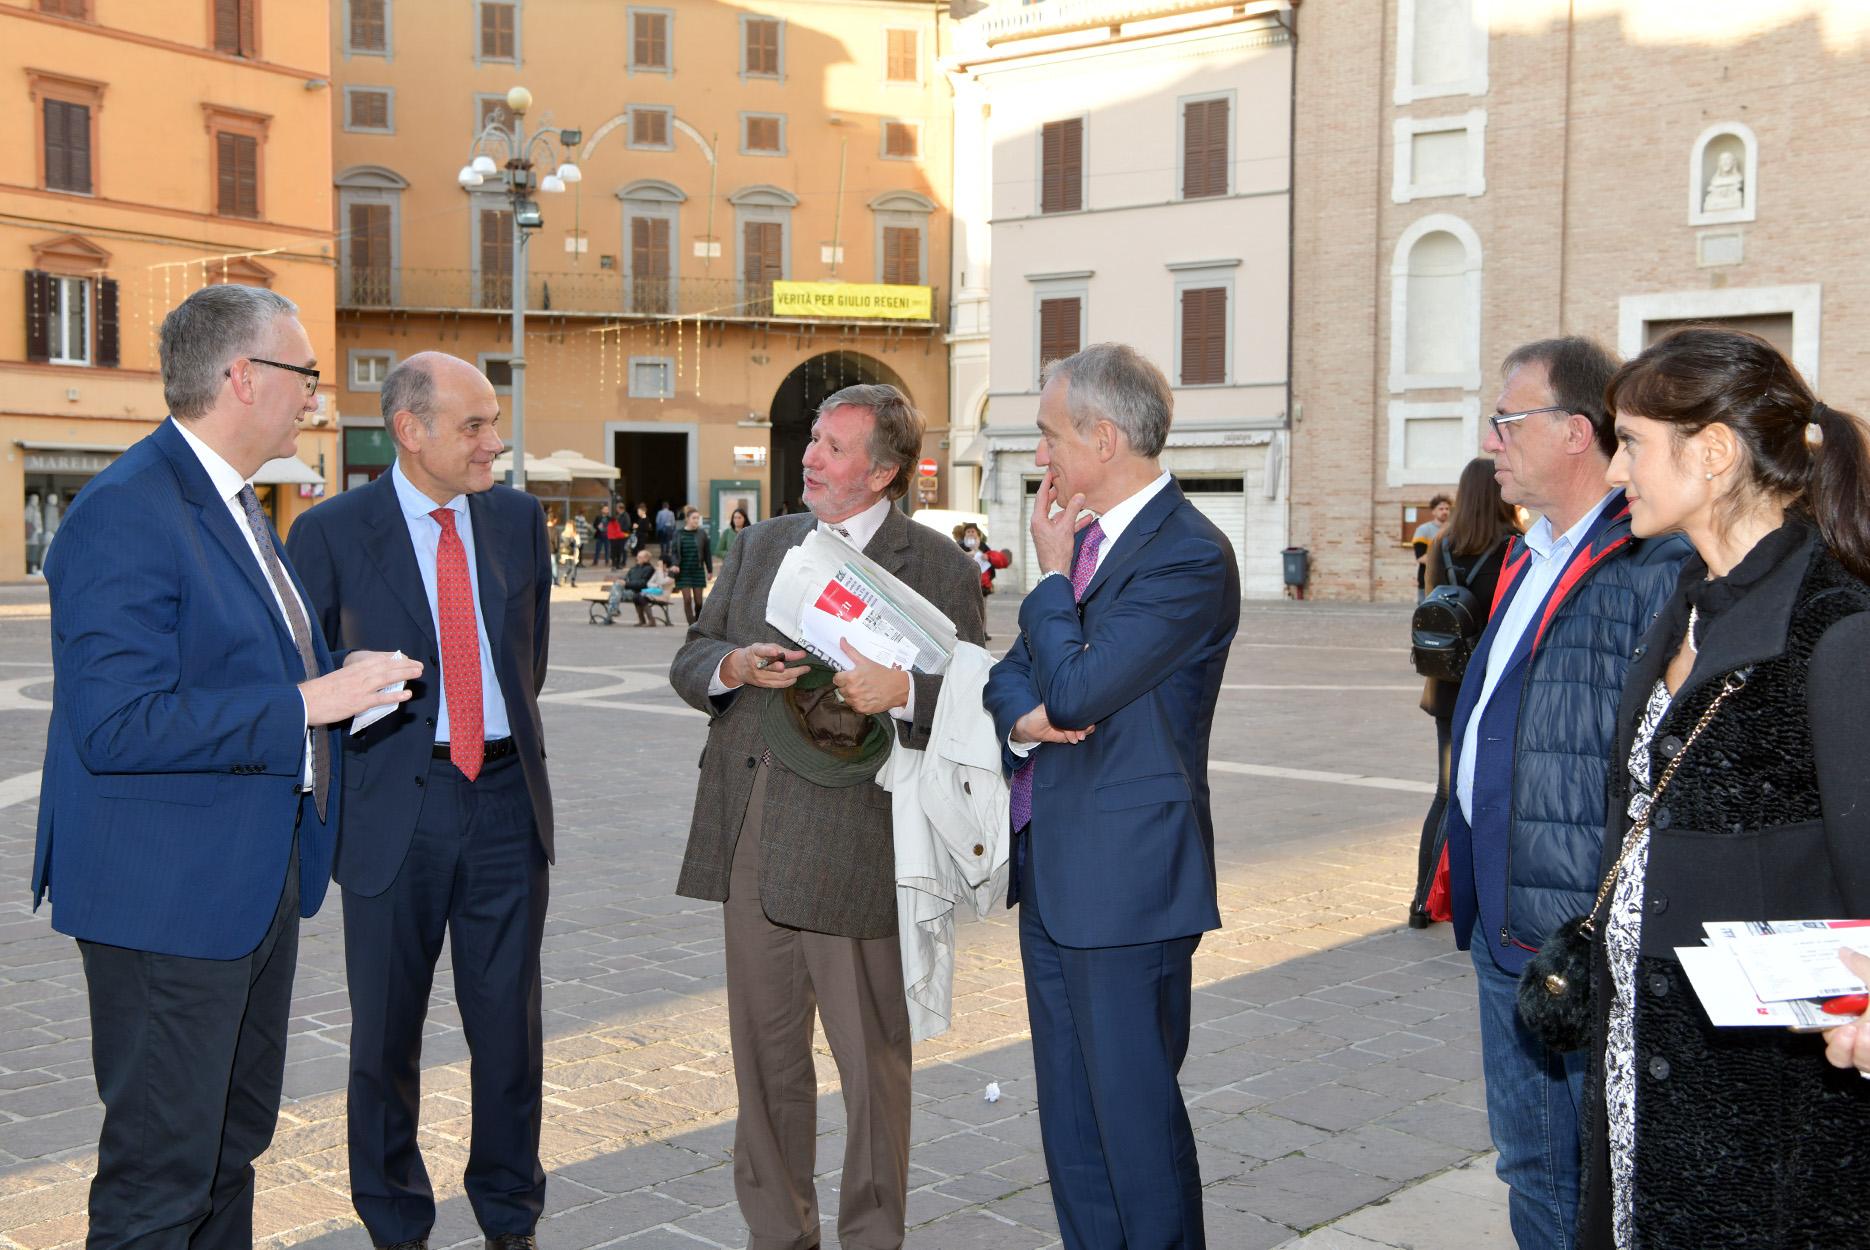 Teatro_Ceriscioli_Consolo